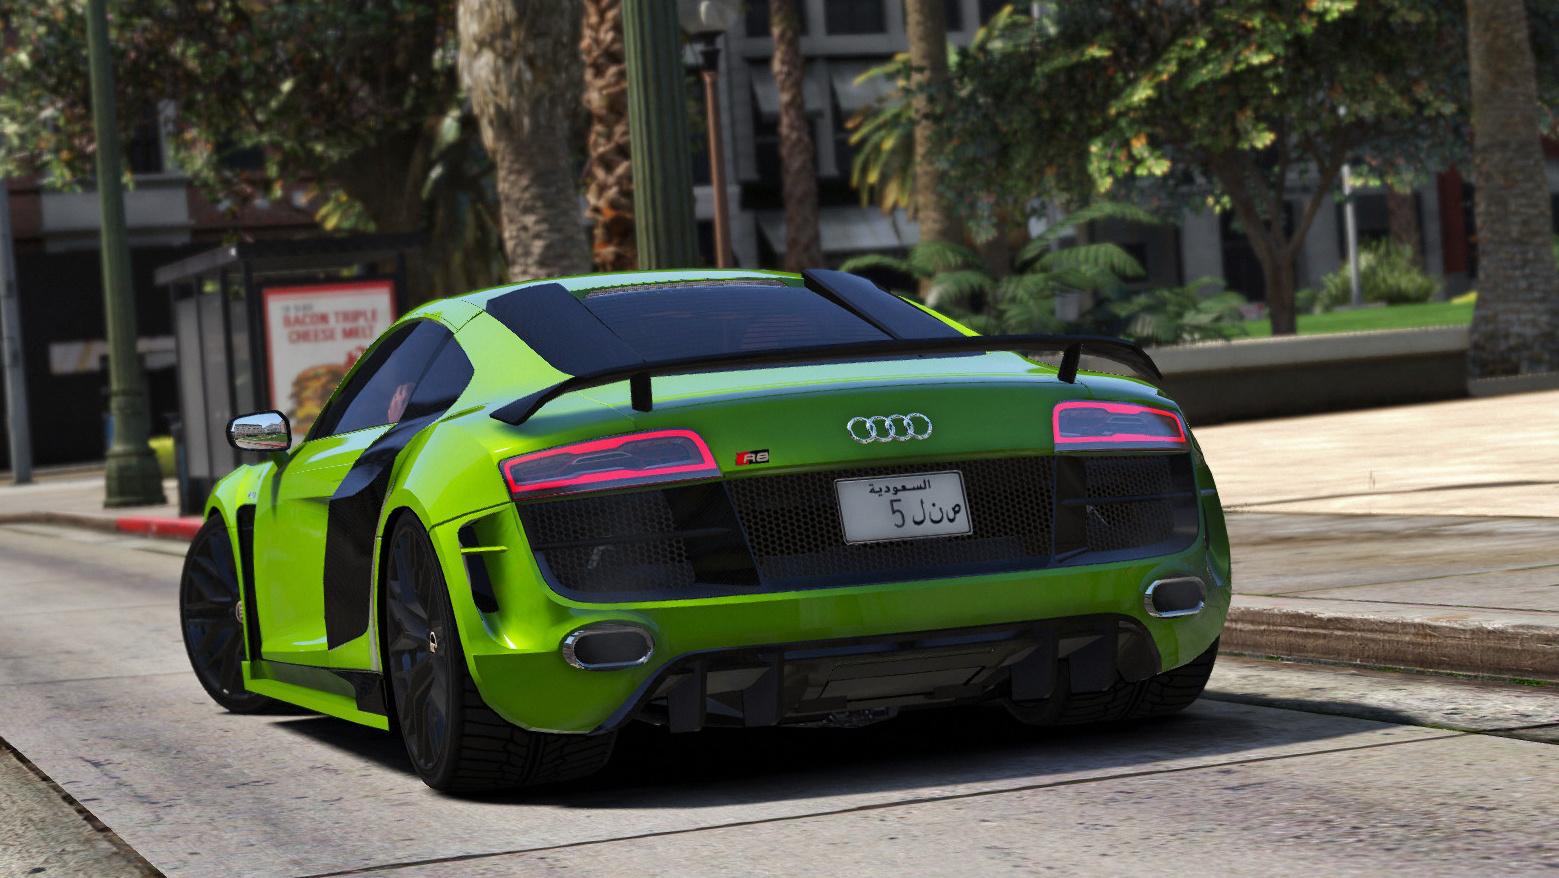 Gemeinsame 2013 Audi R8 V10 & PPI Razor Tuning [Add-On] - GTA5-Mods.com @ZU_93